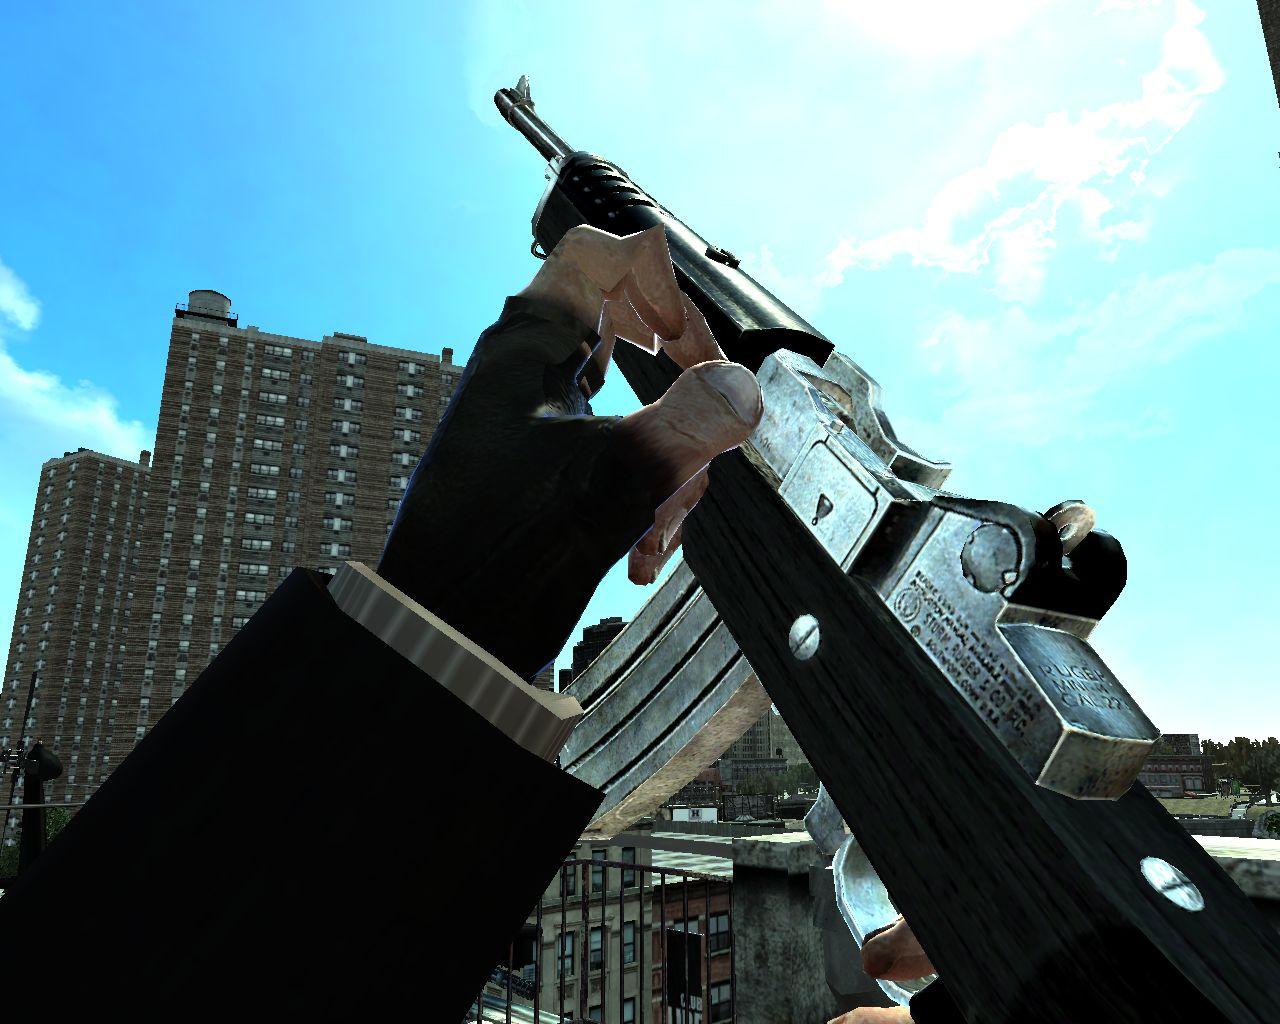 Gta iv weapons.img backup download